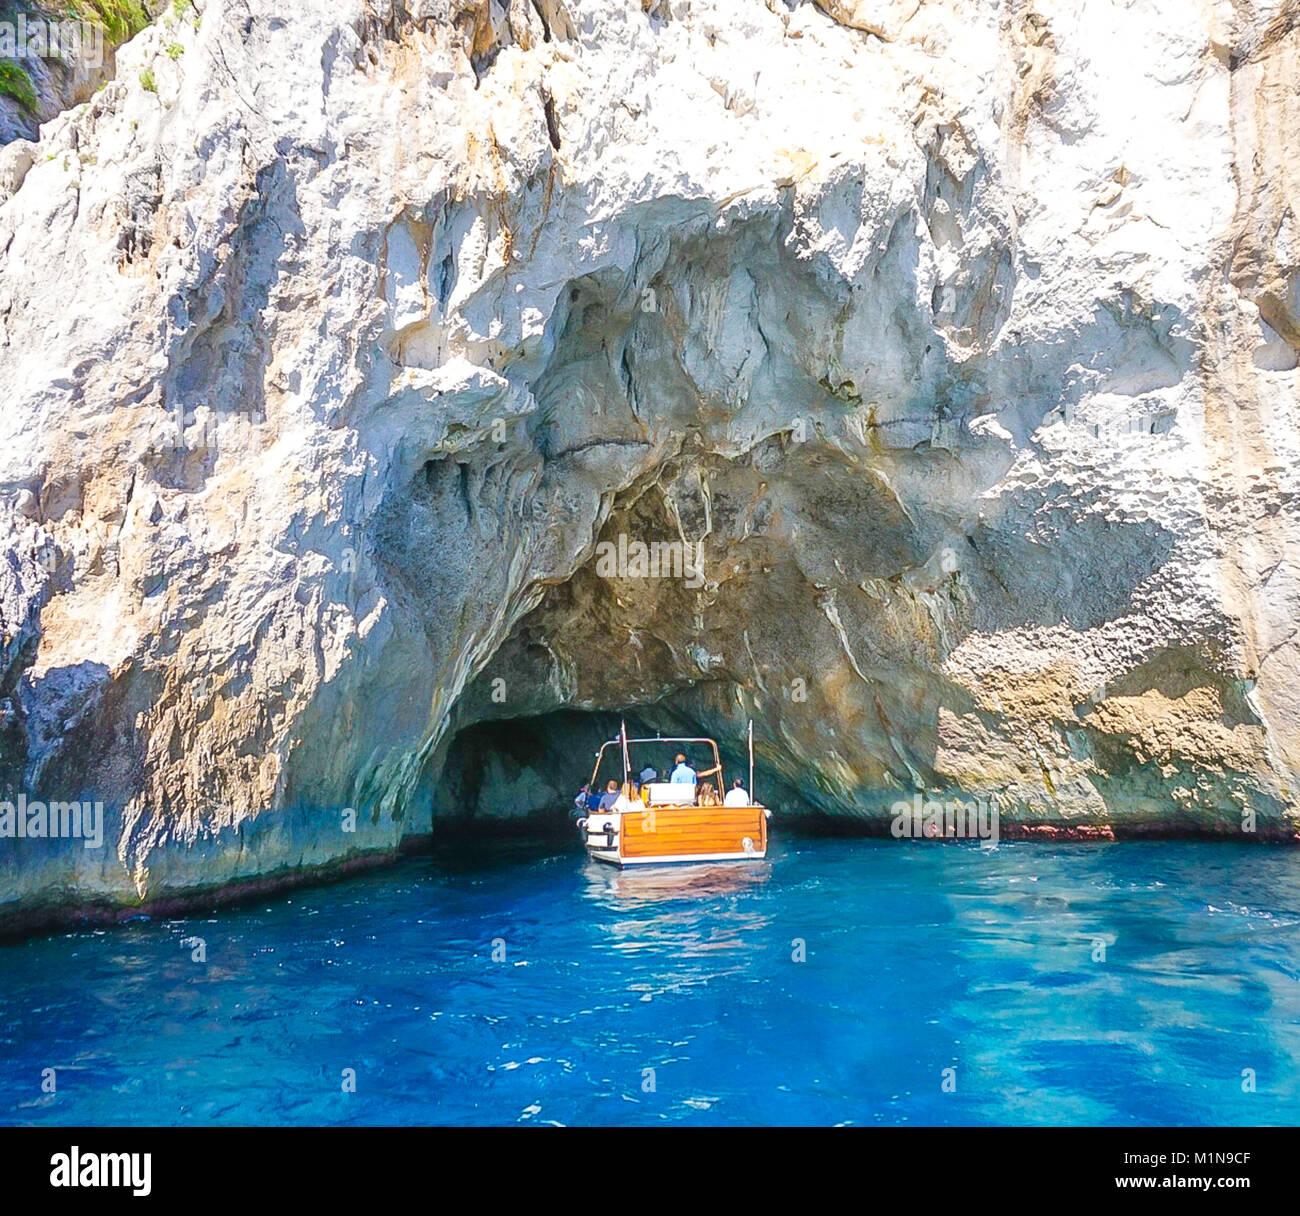 The White Grotto of the island of Capri, Italy.  Coastal Rocks on the Mediterranean Sea at Capri Island from a motor boat tour. Stock Photo